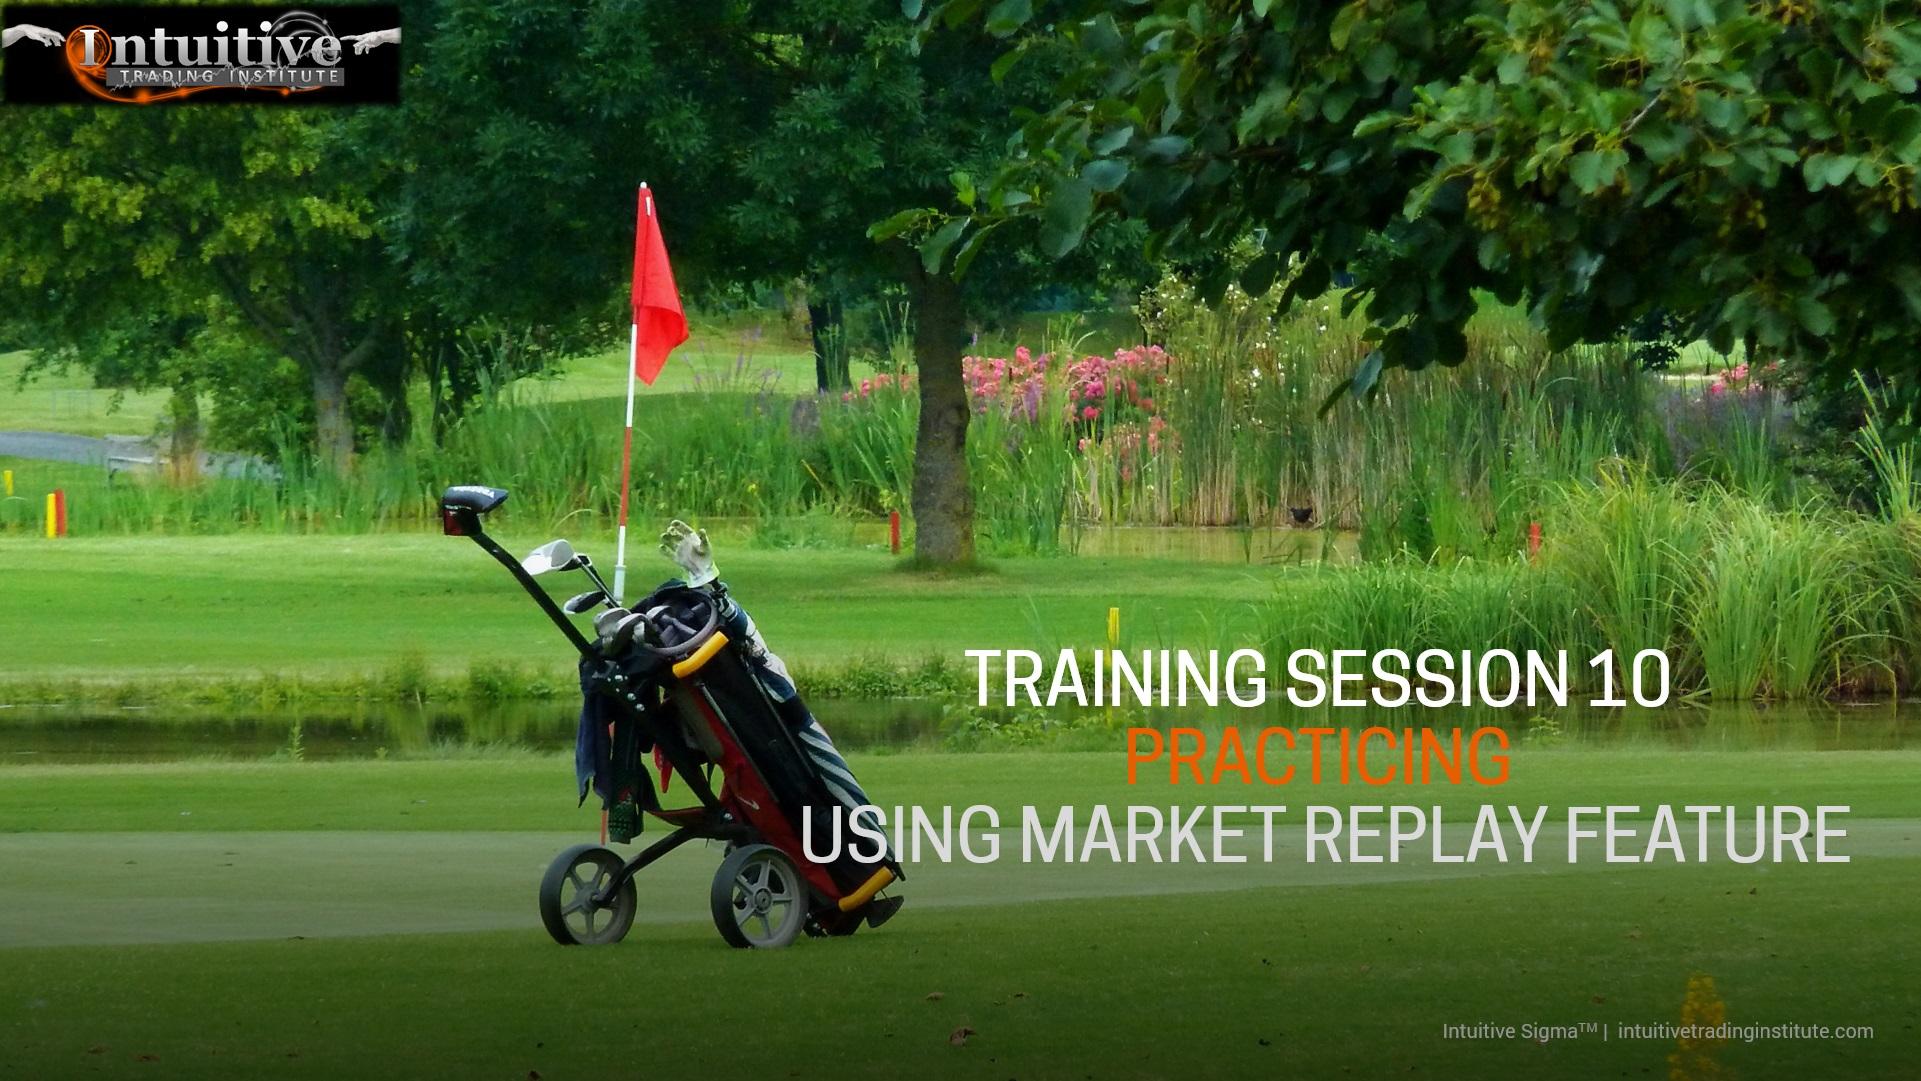 Trainining Session 10